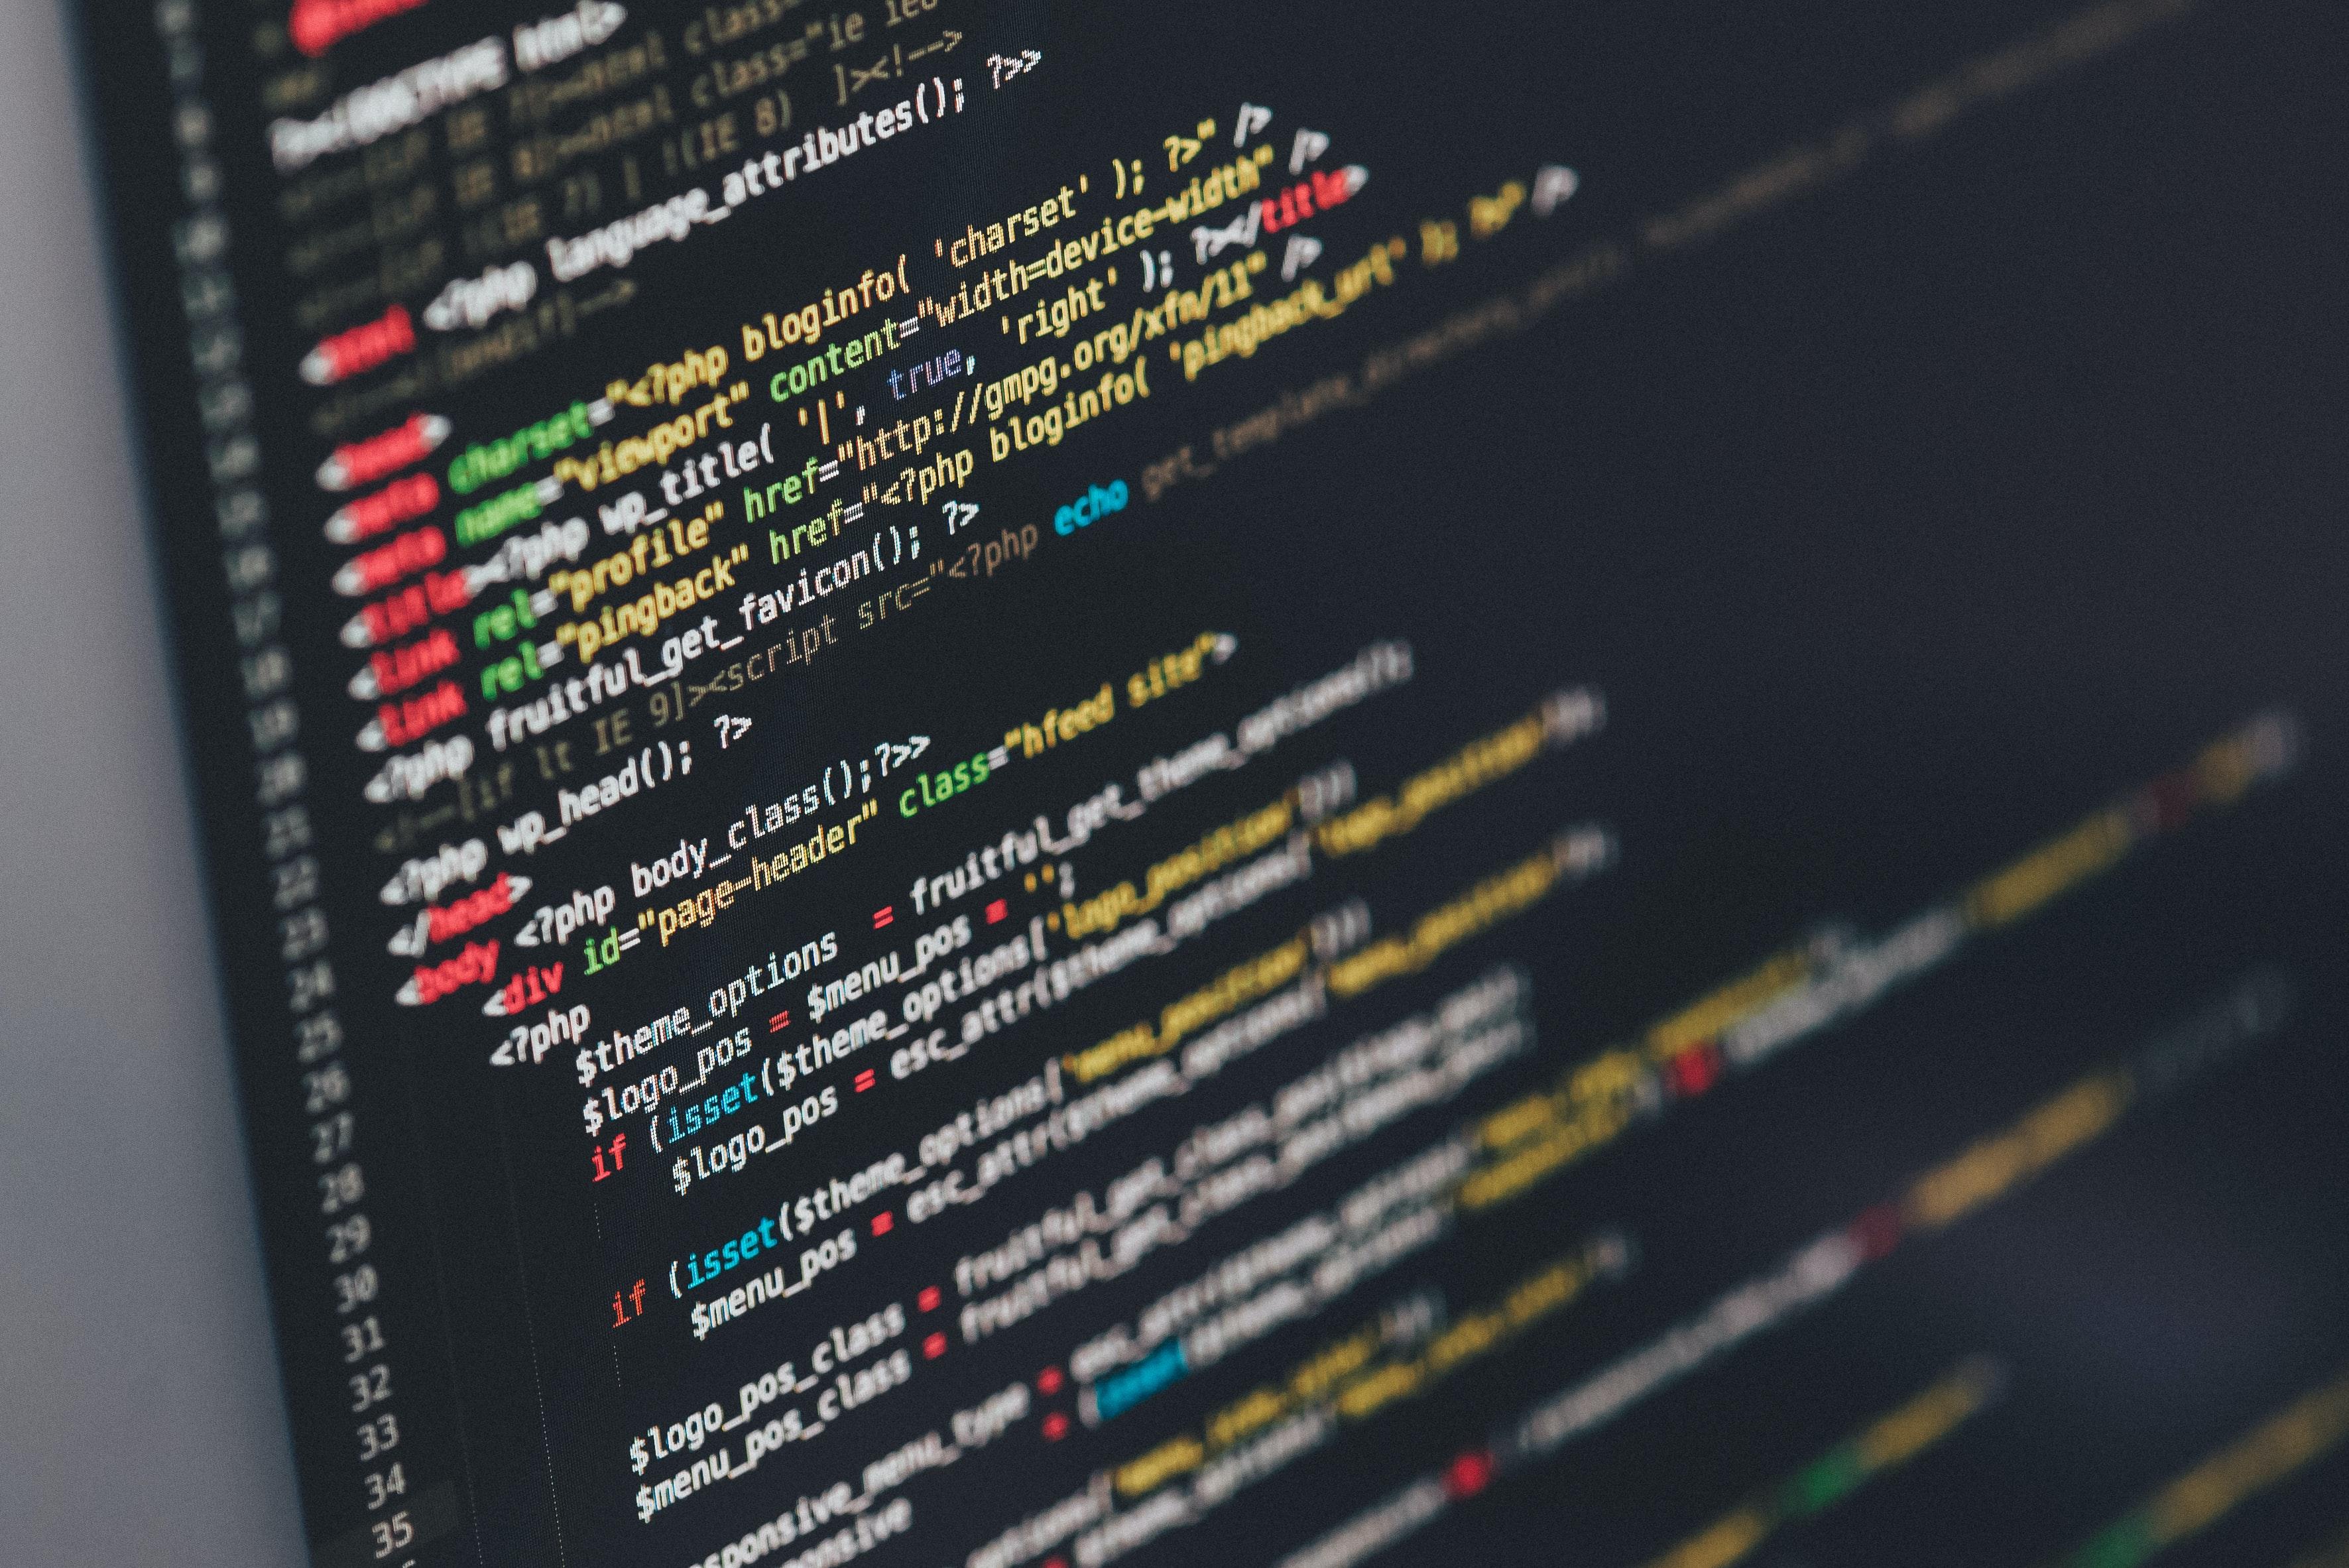 i will code a program using JAVA/Javascript/Python/C